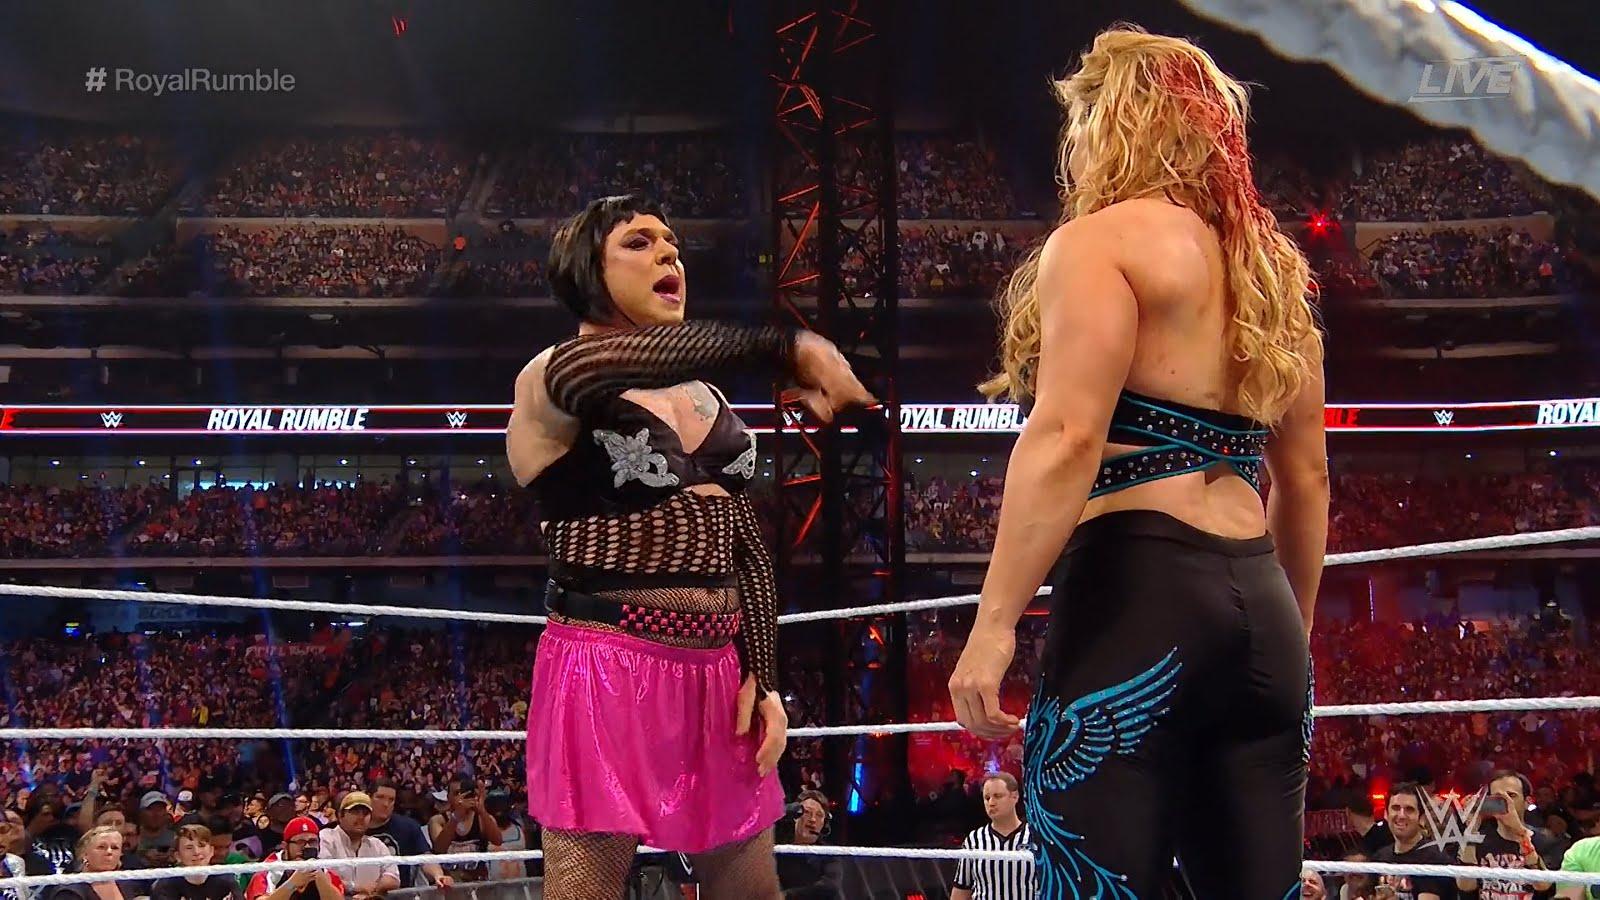 Beth Phoenix sofre corte na cabeça durante a Women's Royal Rumble Match